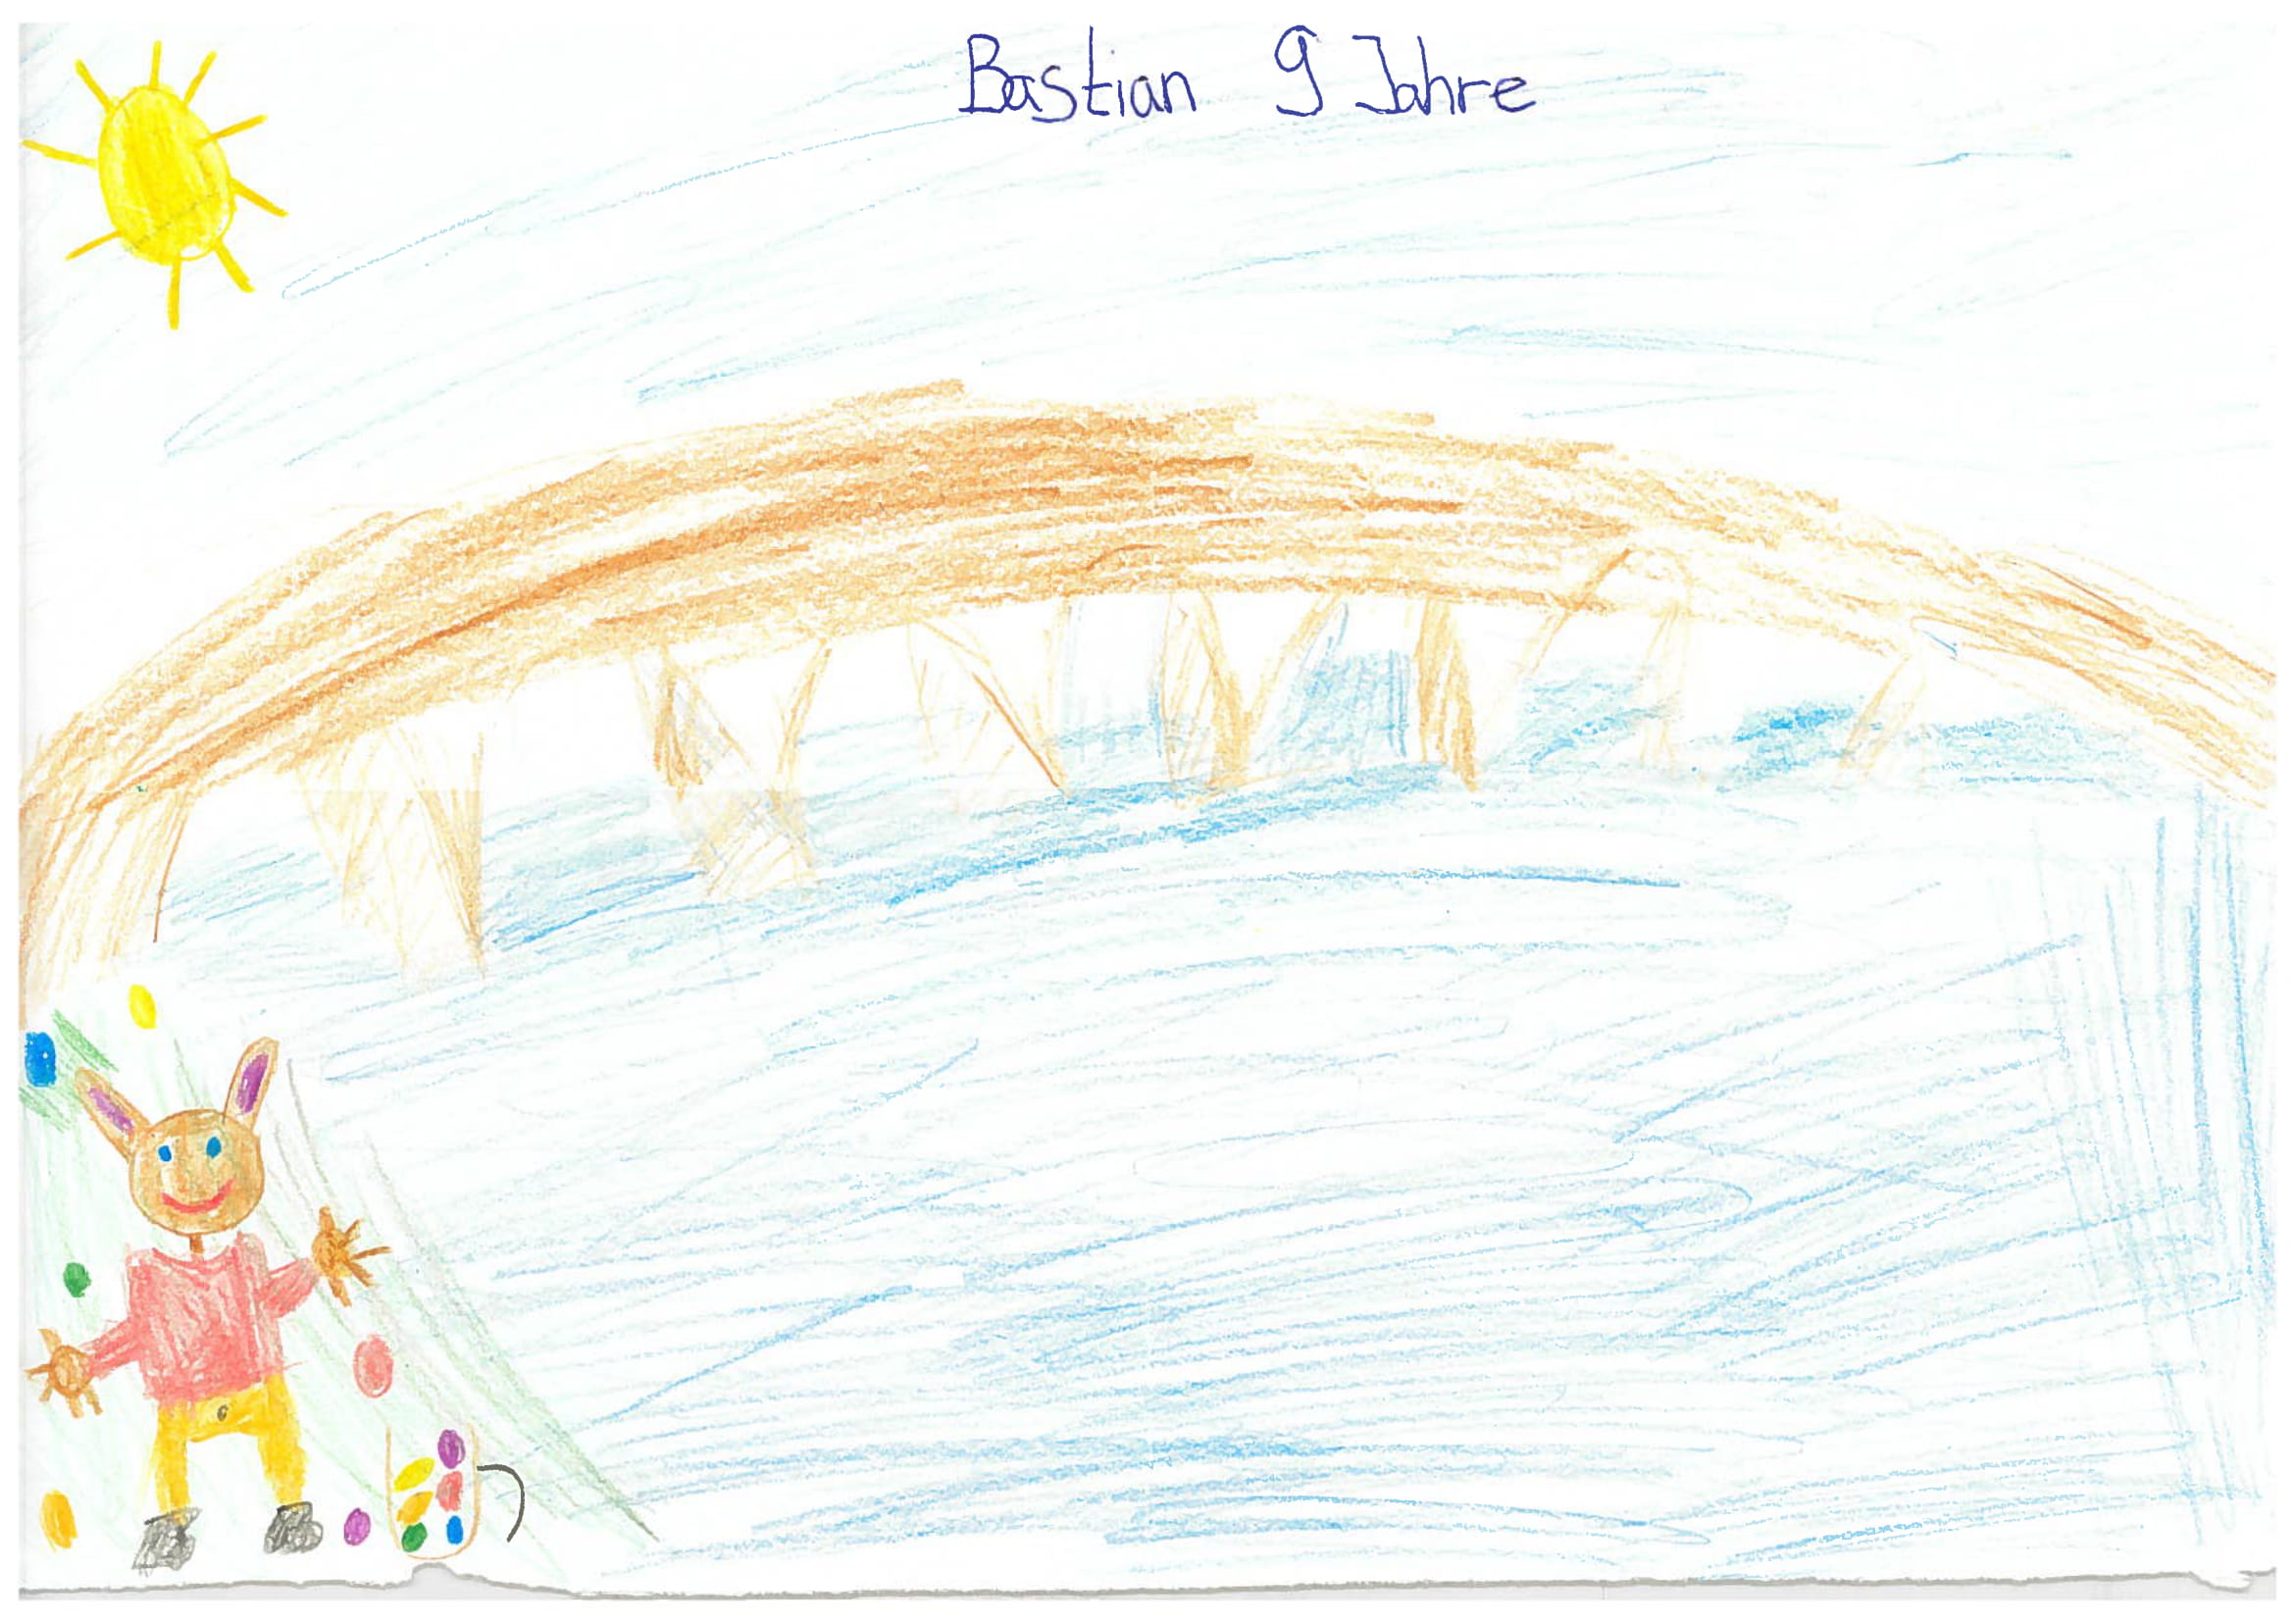 Bastian_9-1